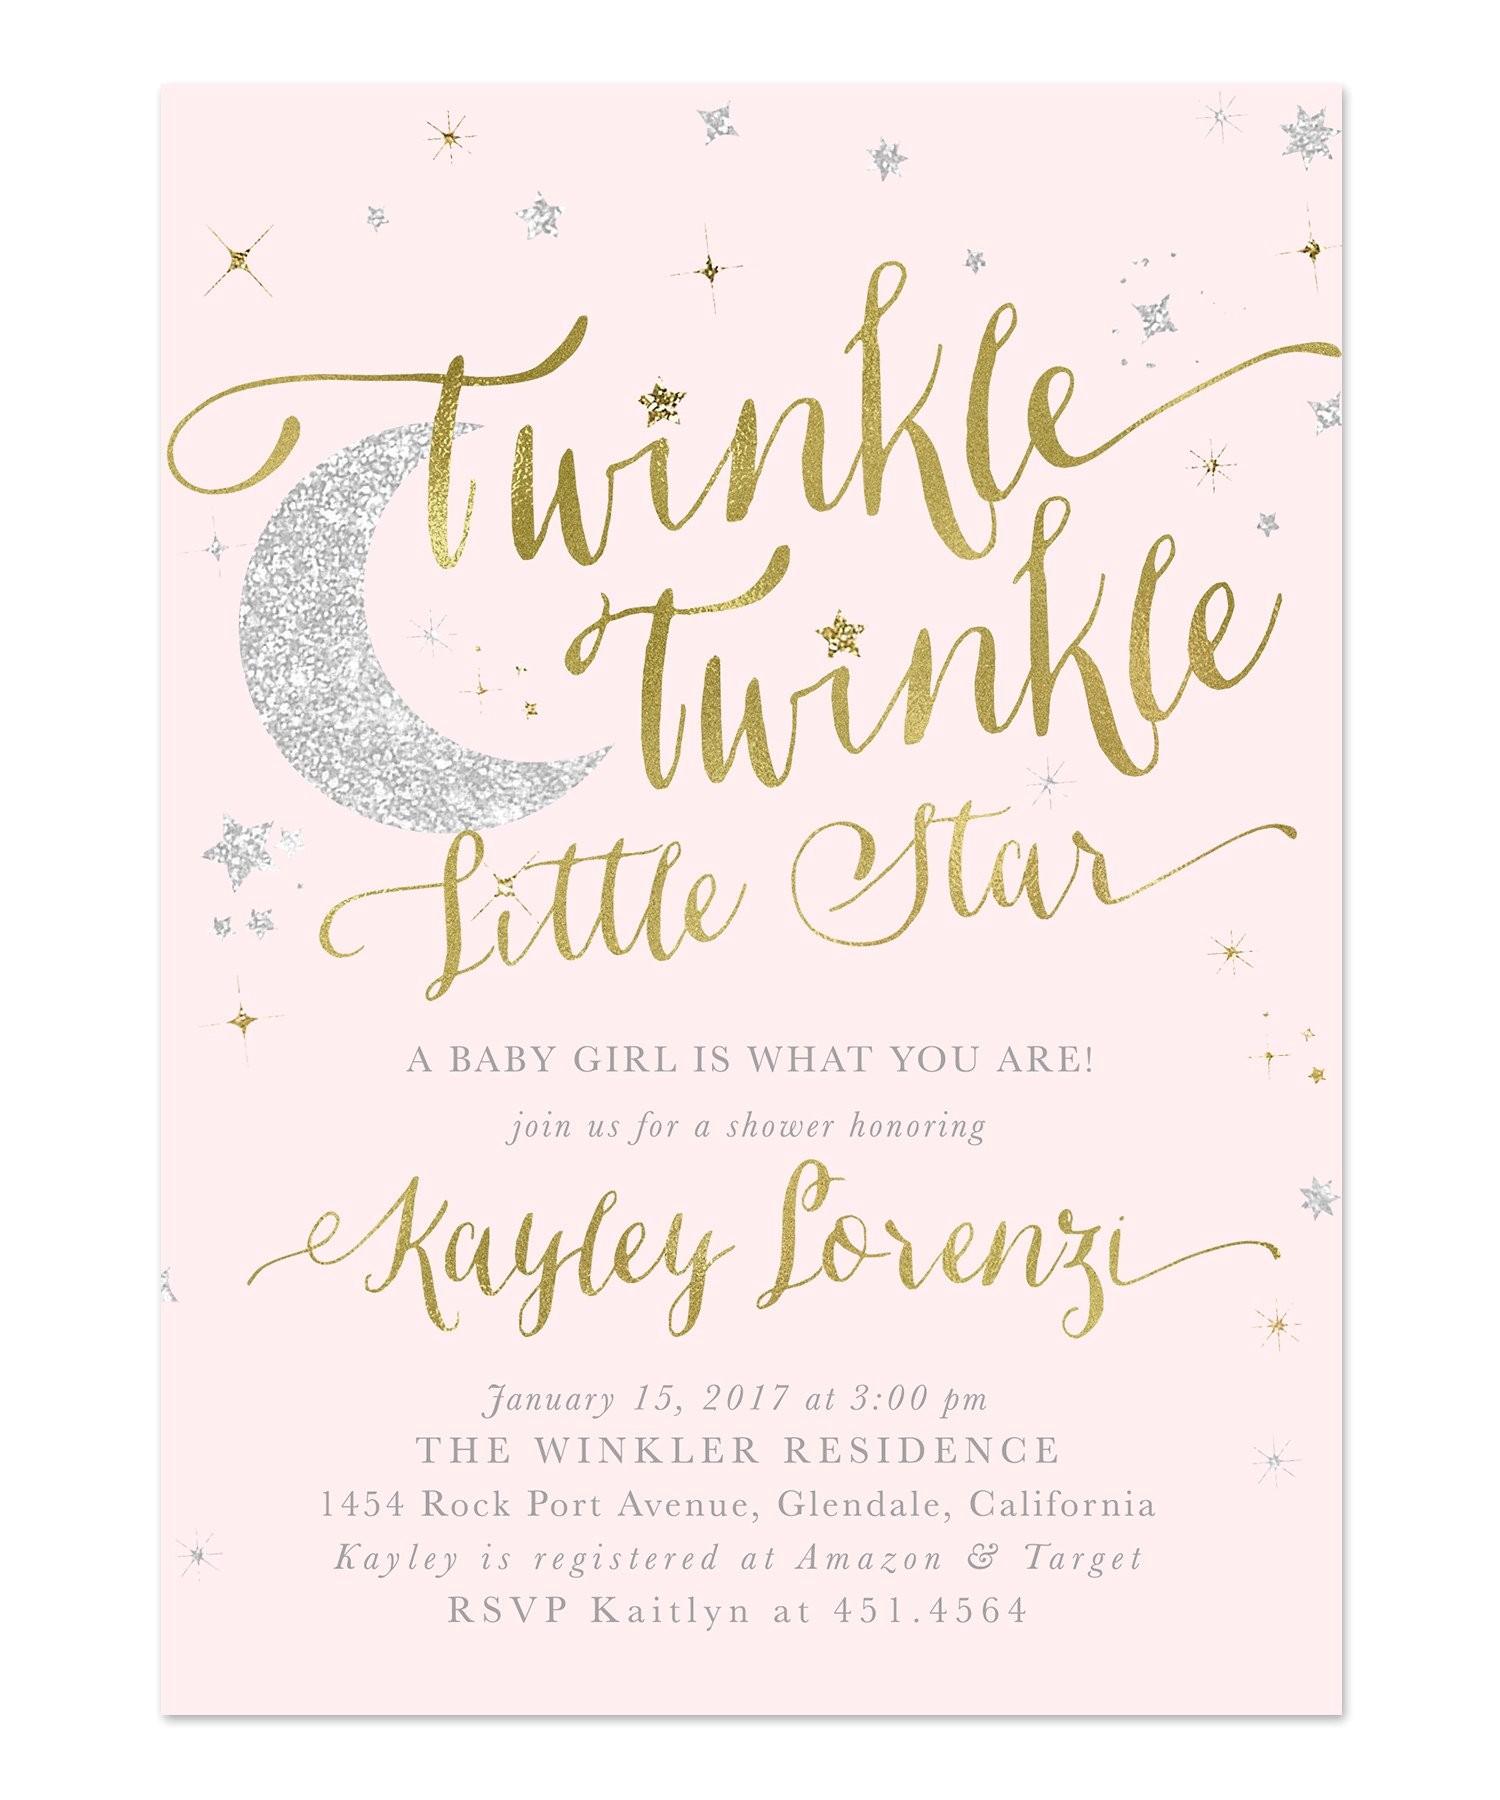 Twinkle Twinkle Little Star Girl Baby Shower Invitations Twinkle Twinkle Little Star Girl Baby Shower or Sprinkle